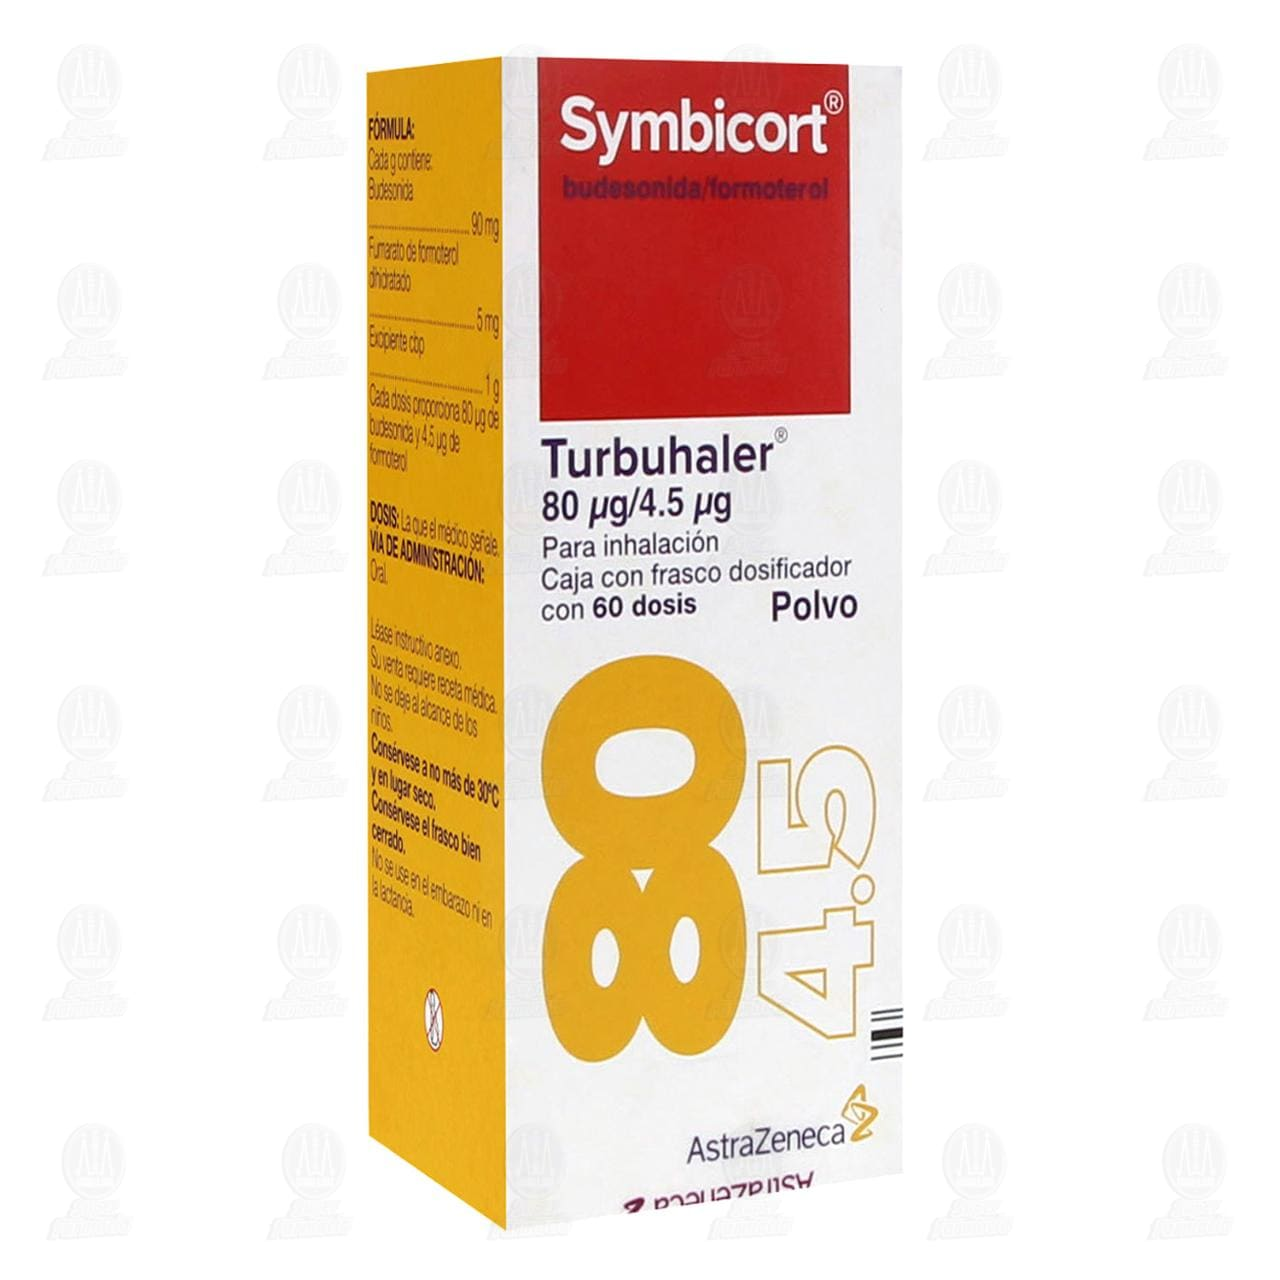 Comprar Symbicort Turbuhaler Polvo 80mcg/4.5mcg 60 Dosis en Farmacias Guadalajara